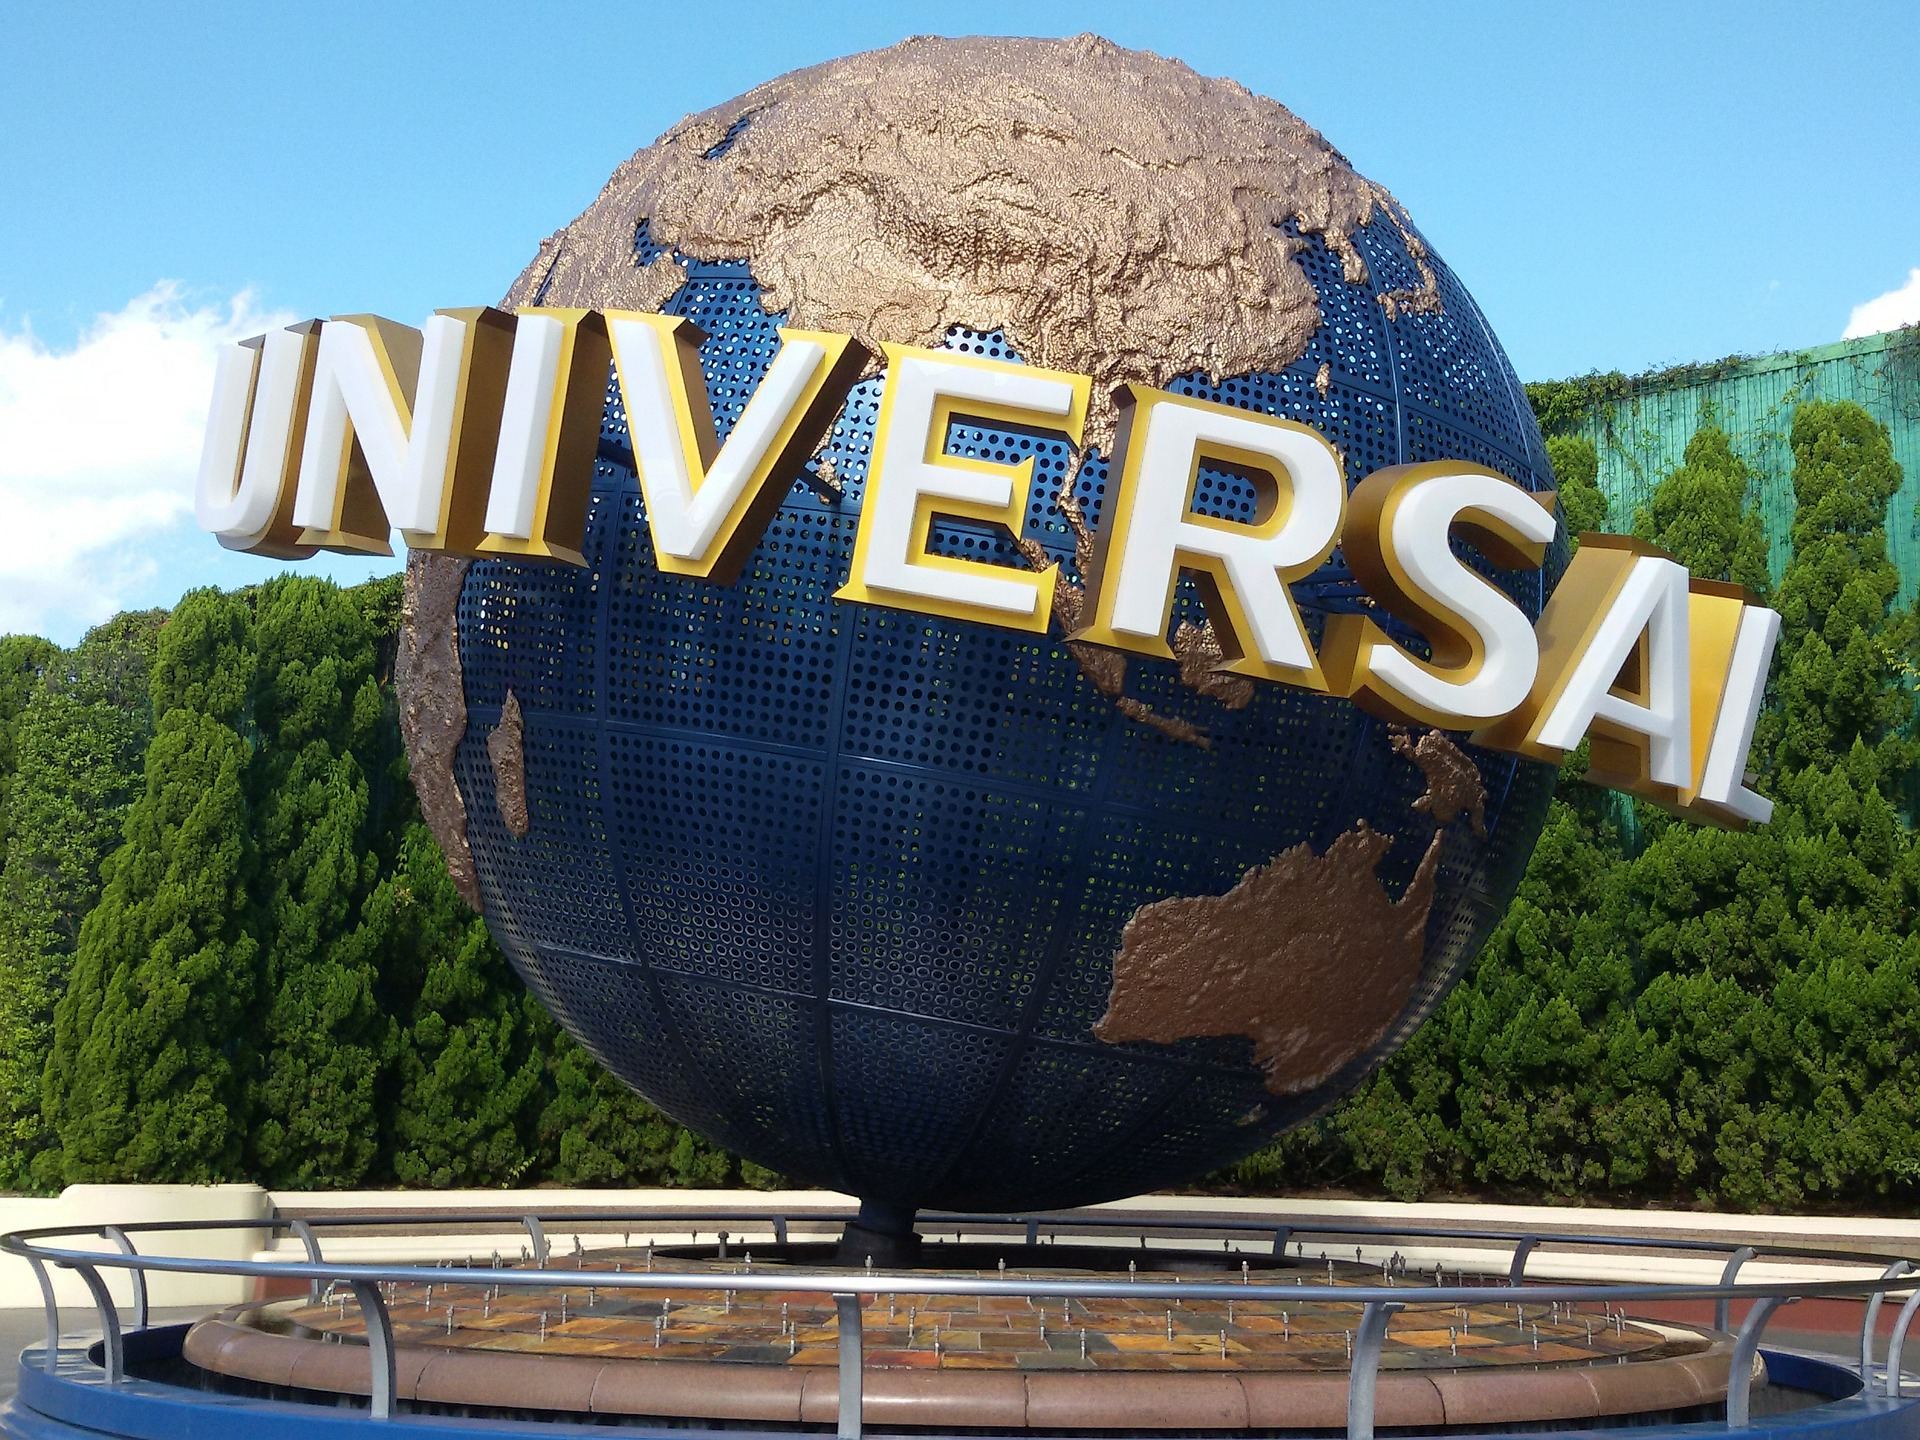 Universal Studio Japan (USJ)